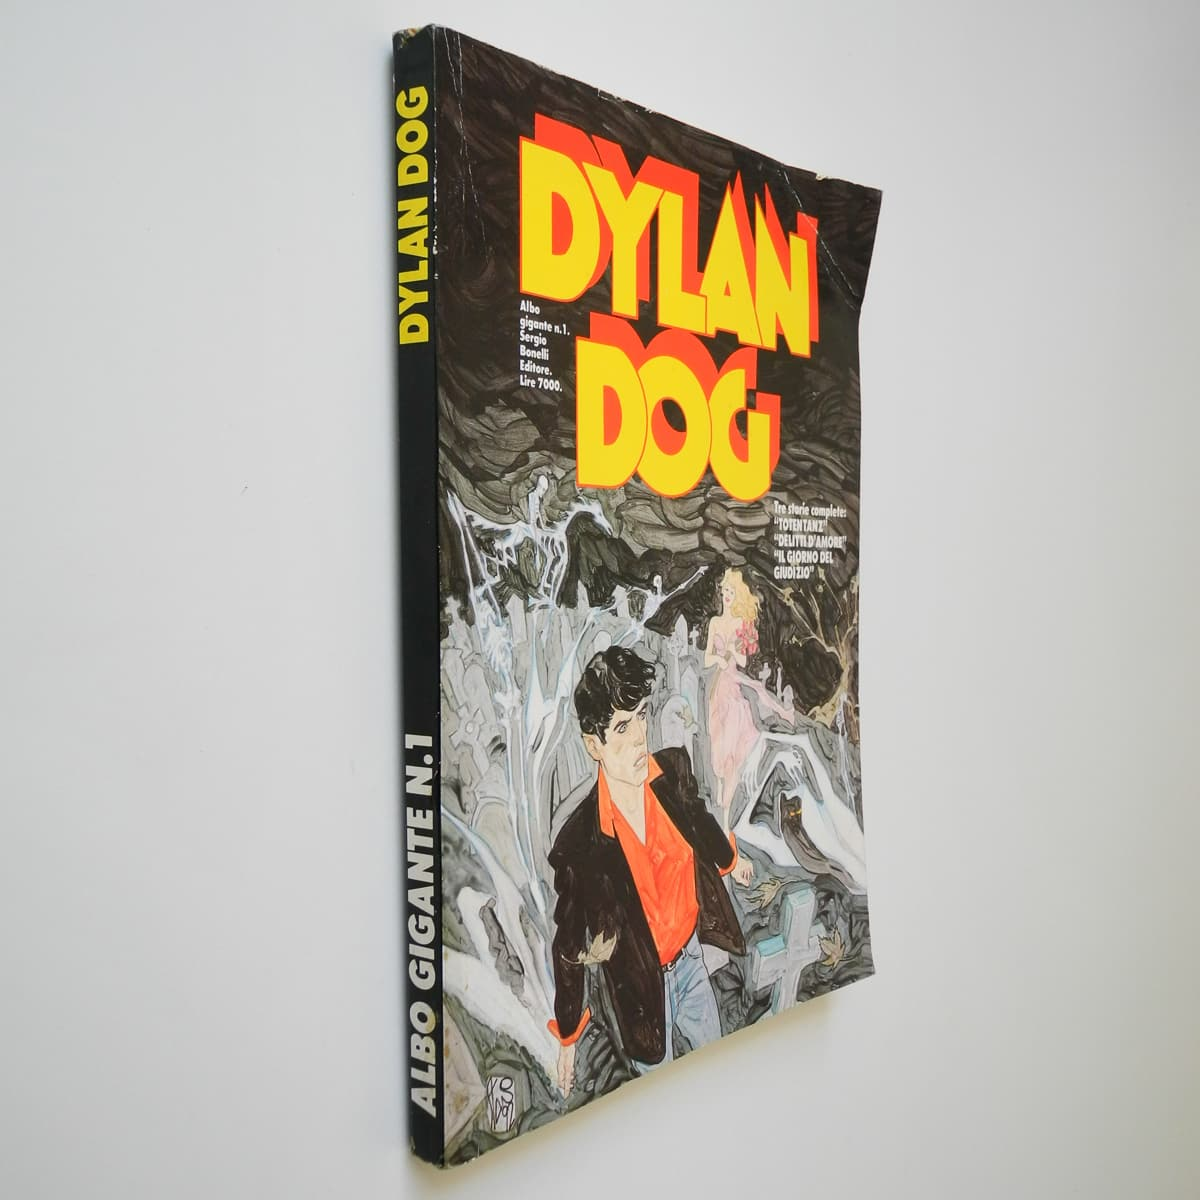 Dylan Dog Albo Gigante n. 1 (2) originale Daim Press